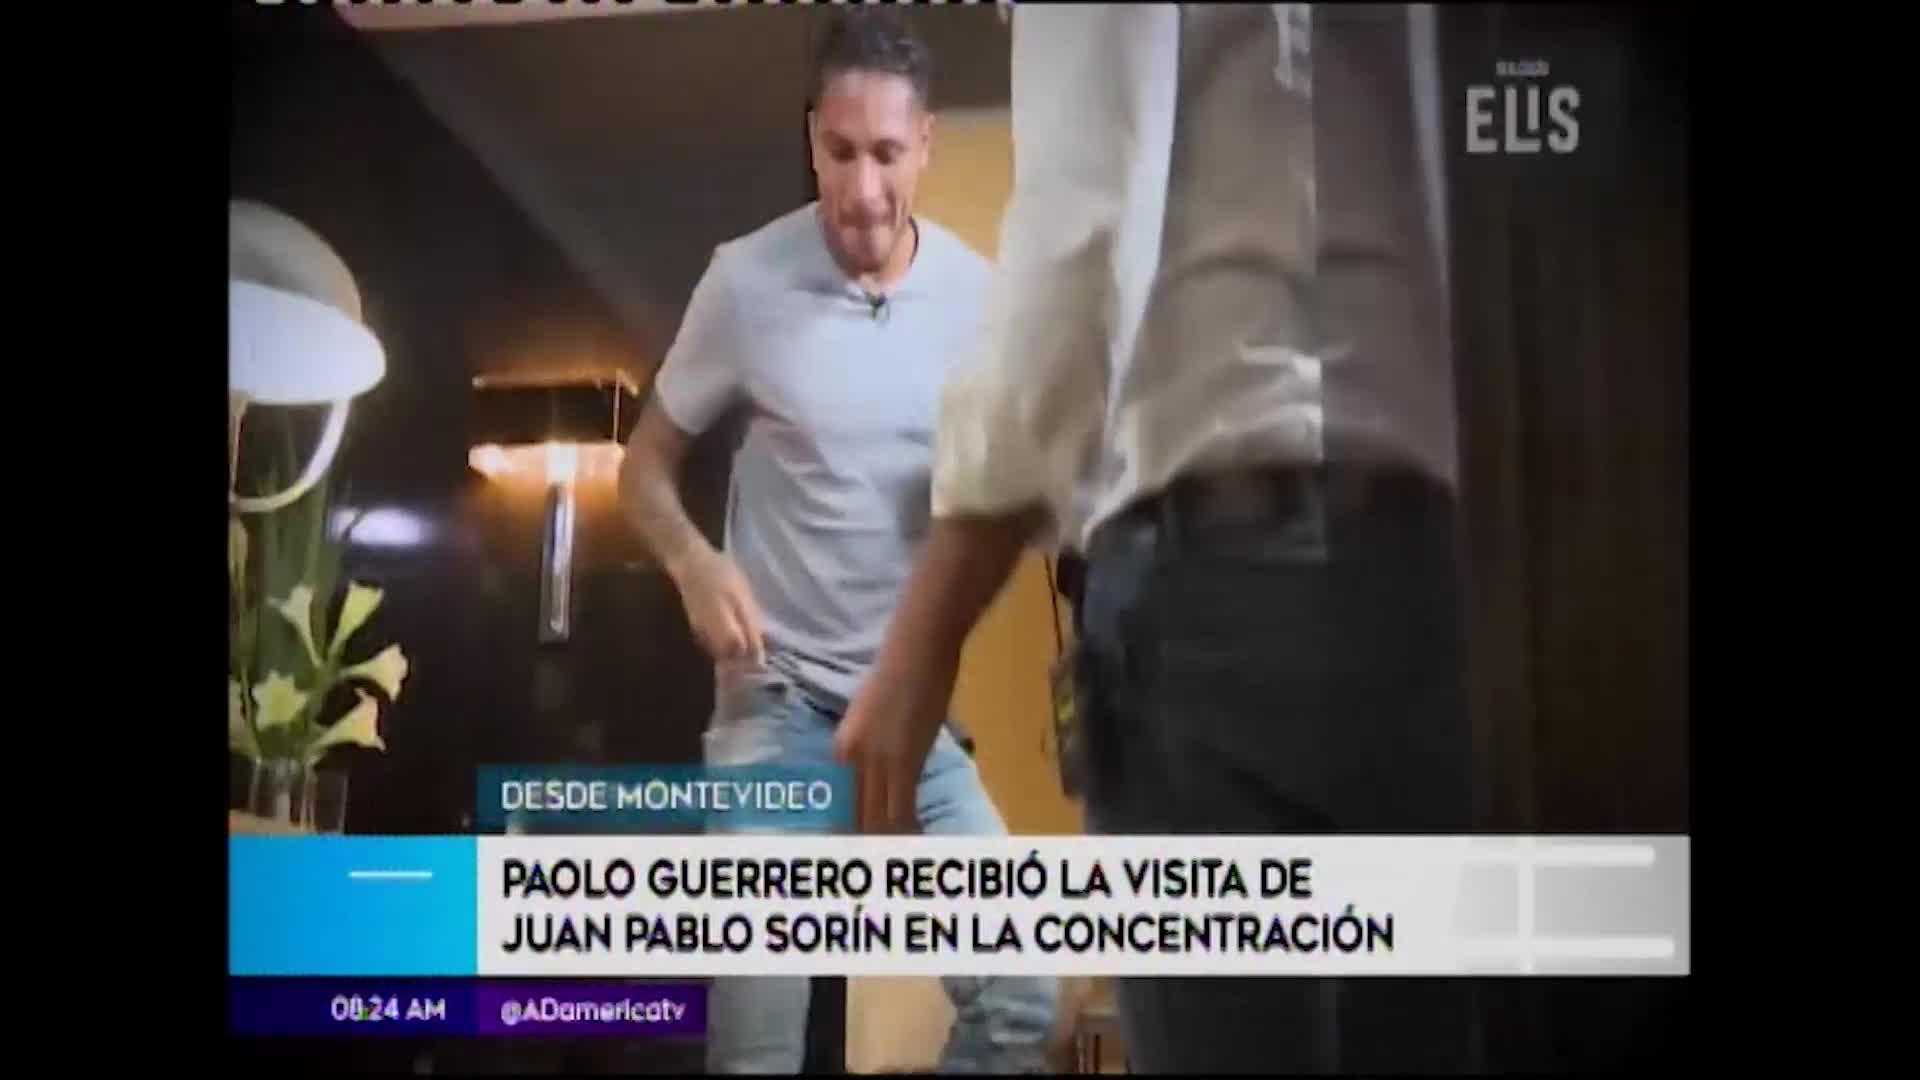 Paolo Guerrero recibe visita de Juan Pablo Sorín